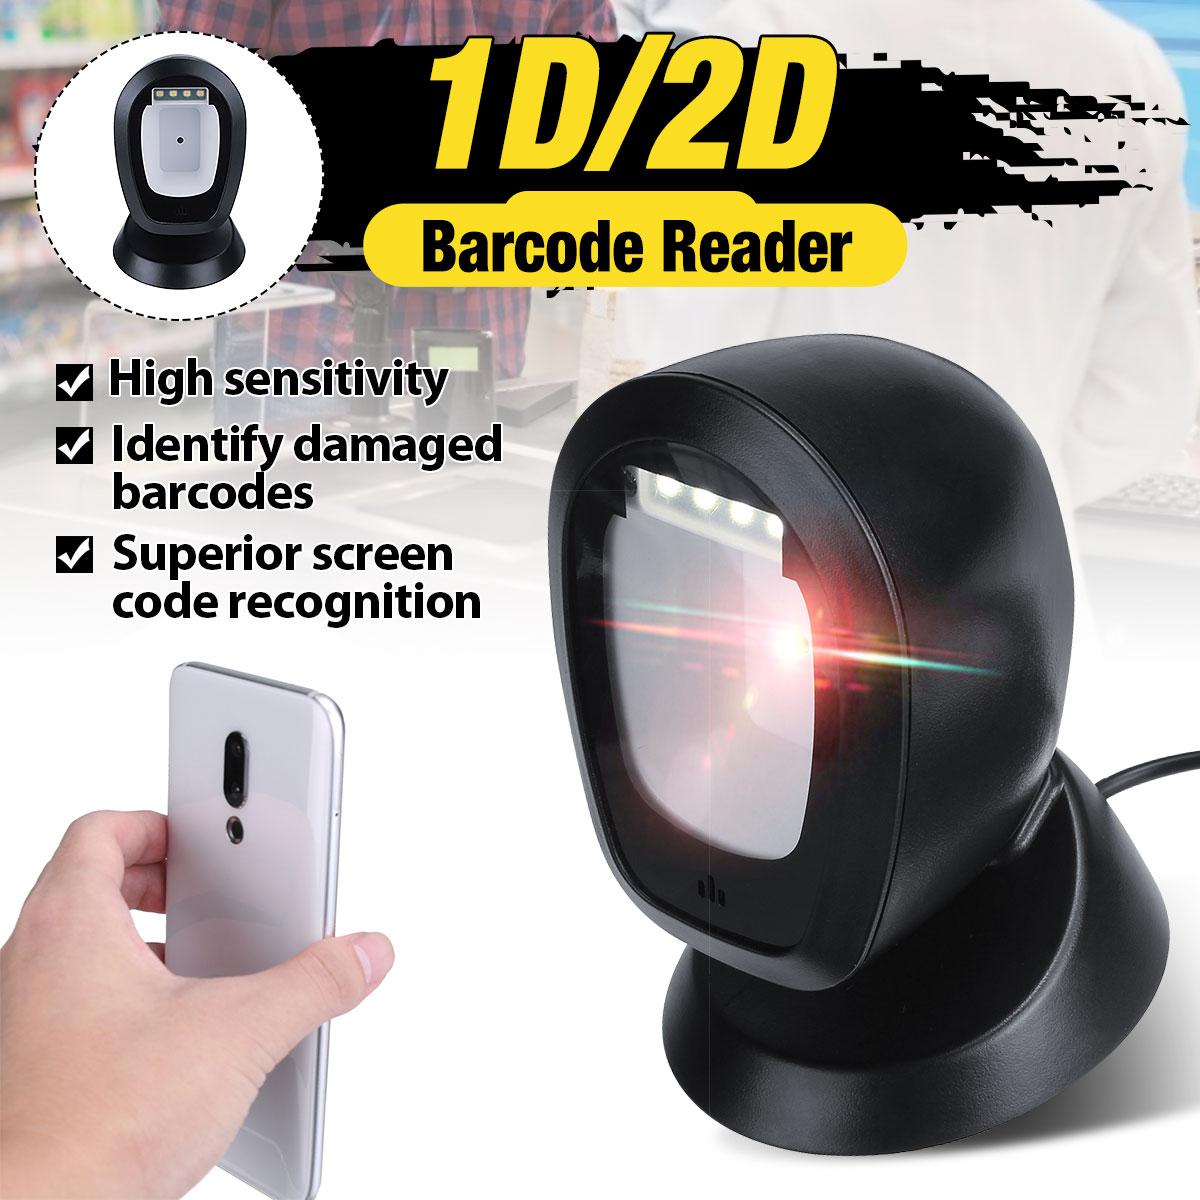 USB เครื่องสแกนบาร์โค้ดอัตโนมัติแฮนด์ฟรี 1D 2D Barcode Scanner 360 องศา Rorating แพลตฟอร์มการสแกนอินเทอร์เฟซ USB